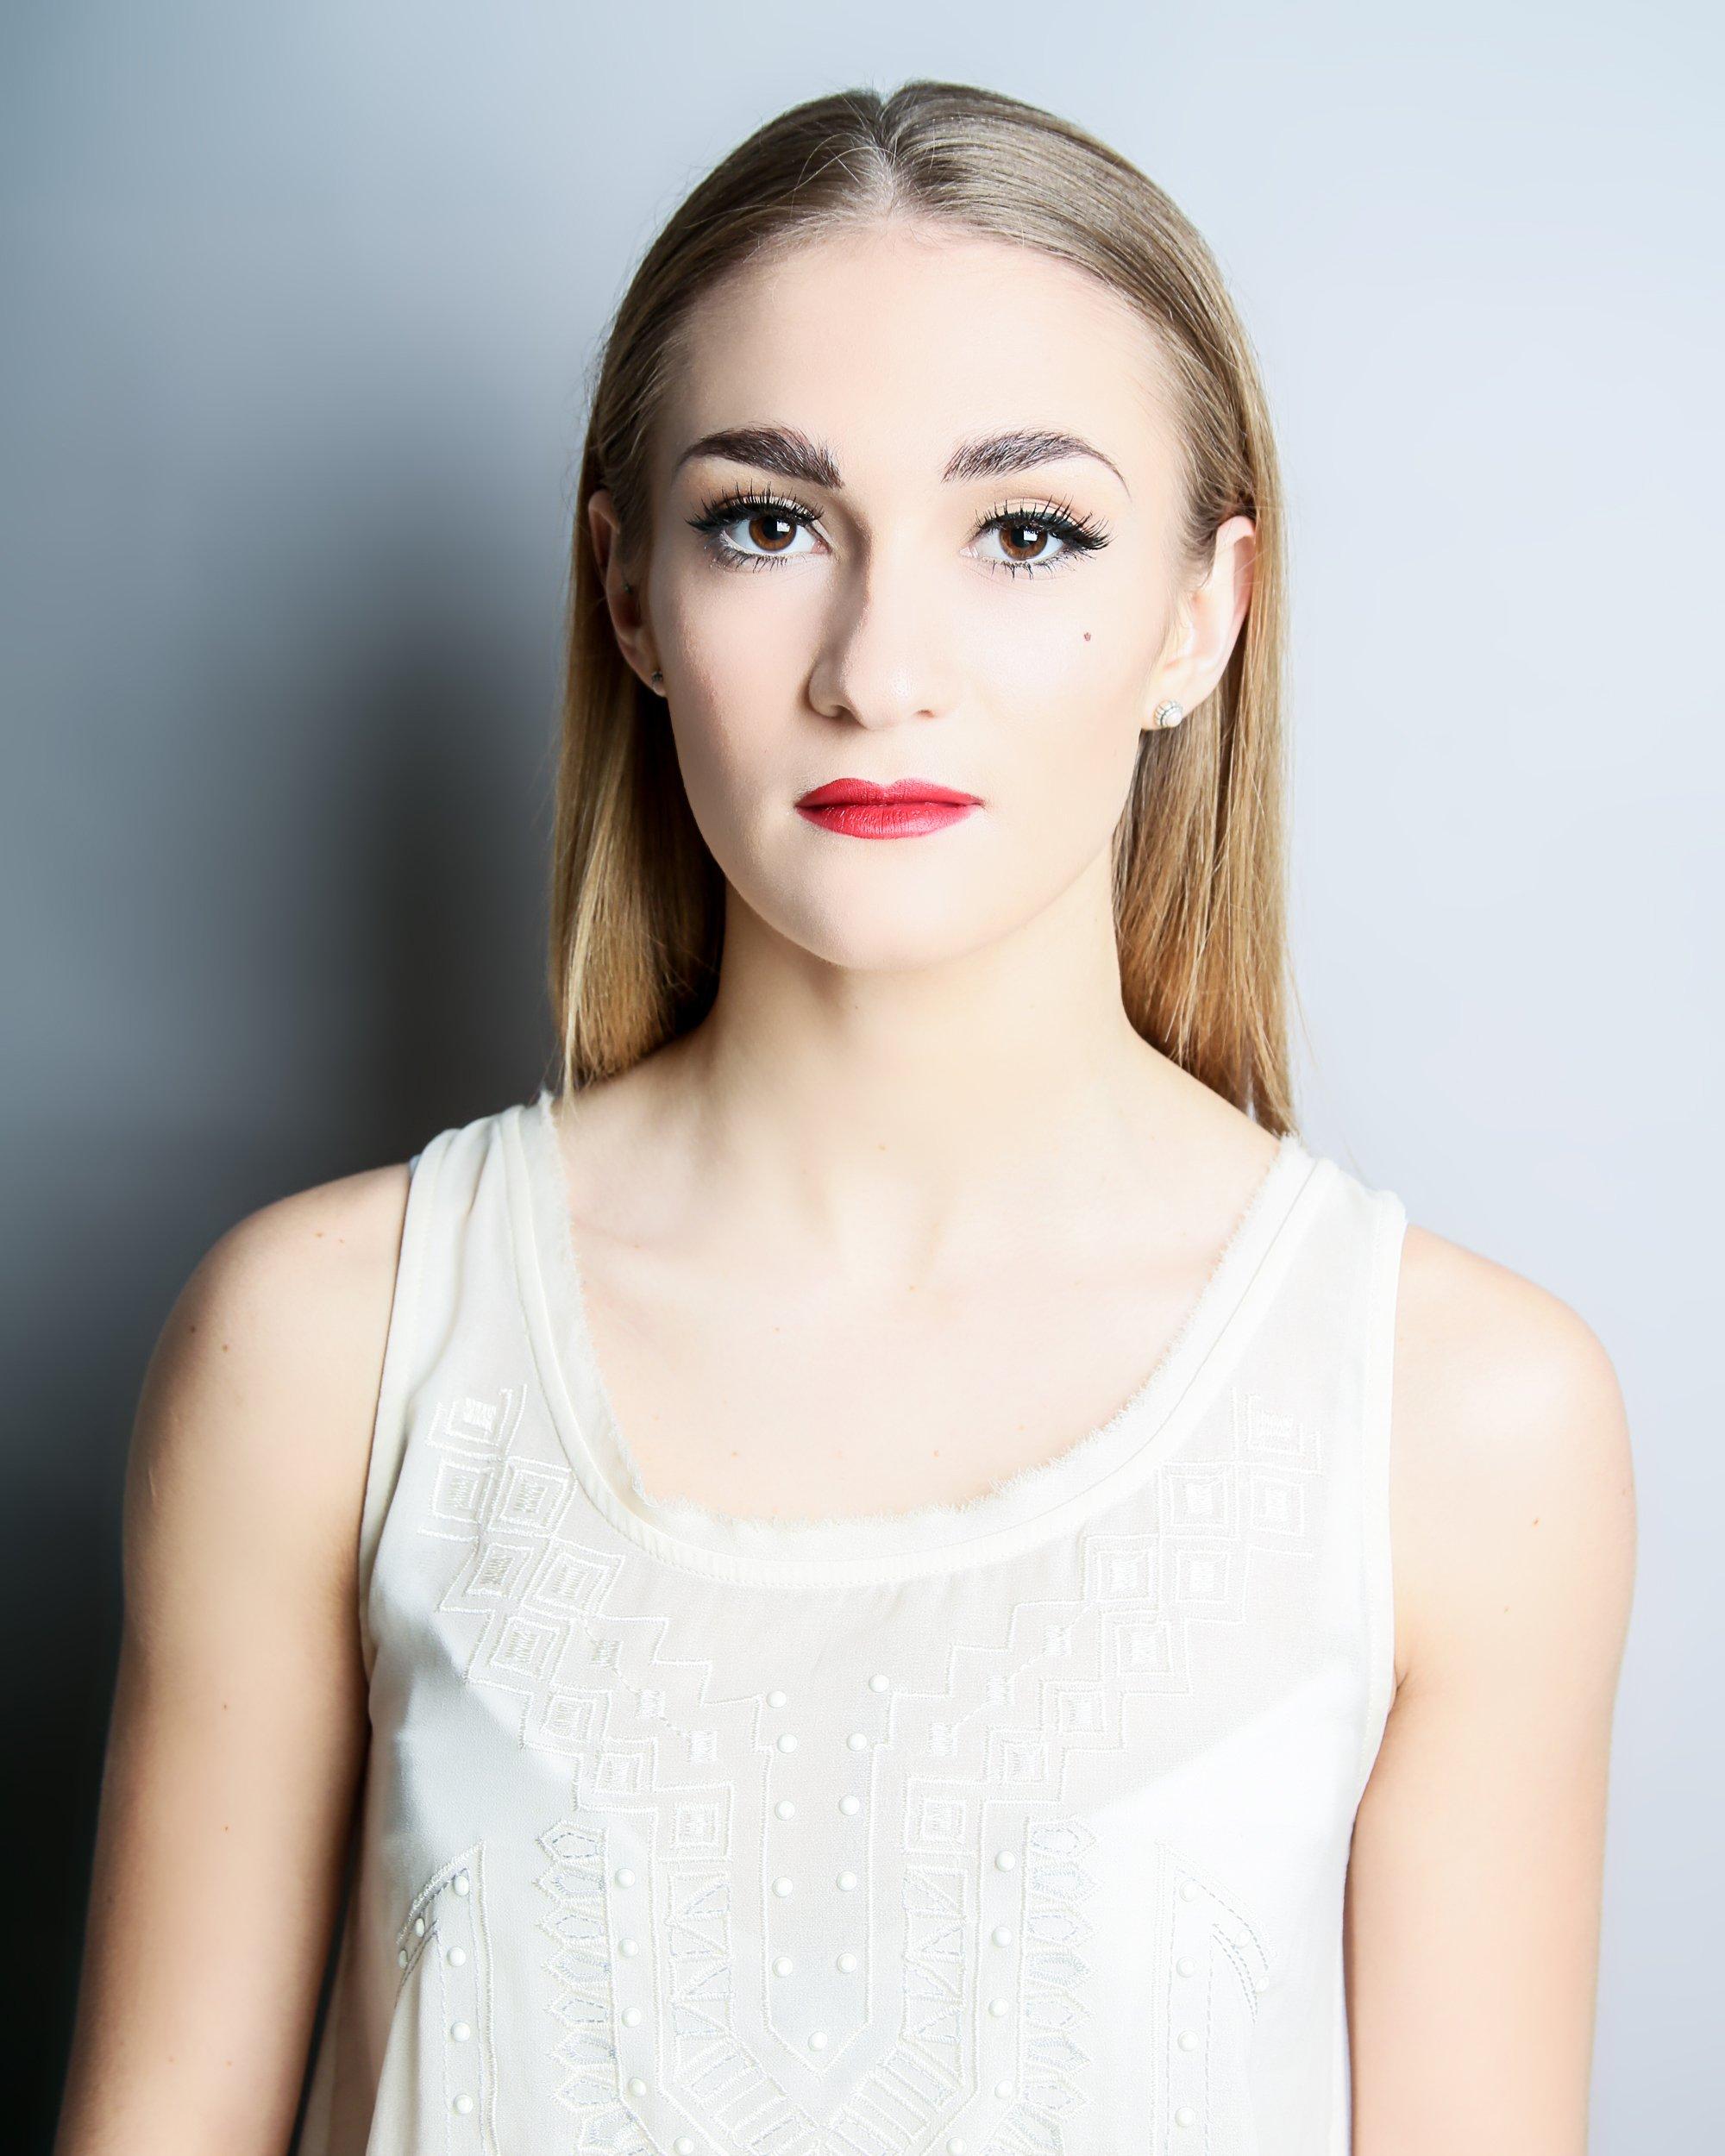 Performer Headshots, Model, Calling Card for Agency Signing, Turbo Headshot Service, Laura Pearman Photography, Laura Pearman, Headshots, Modelling